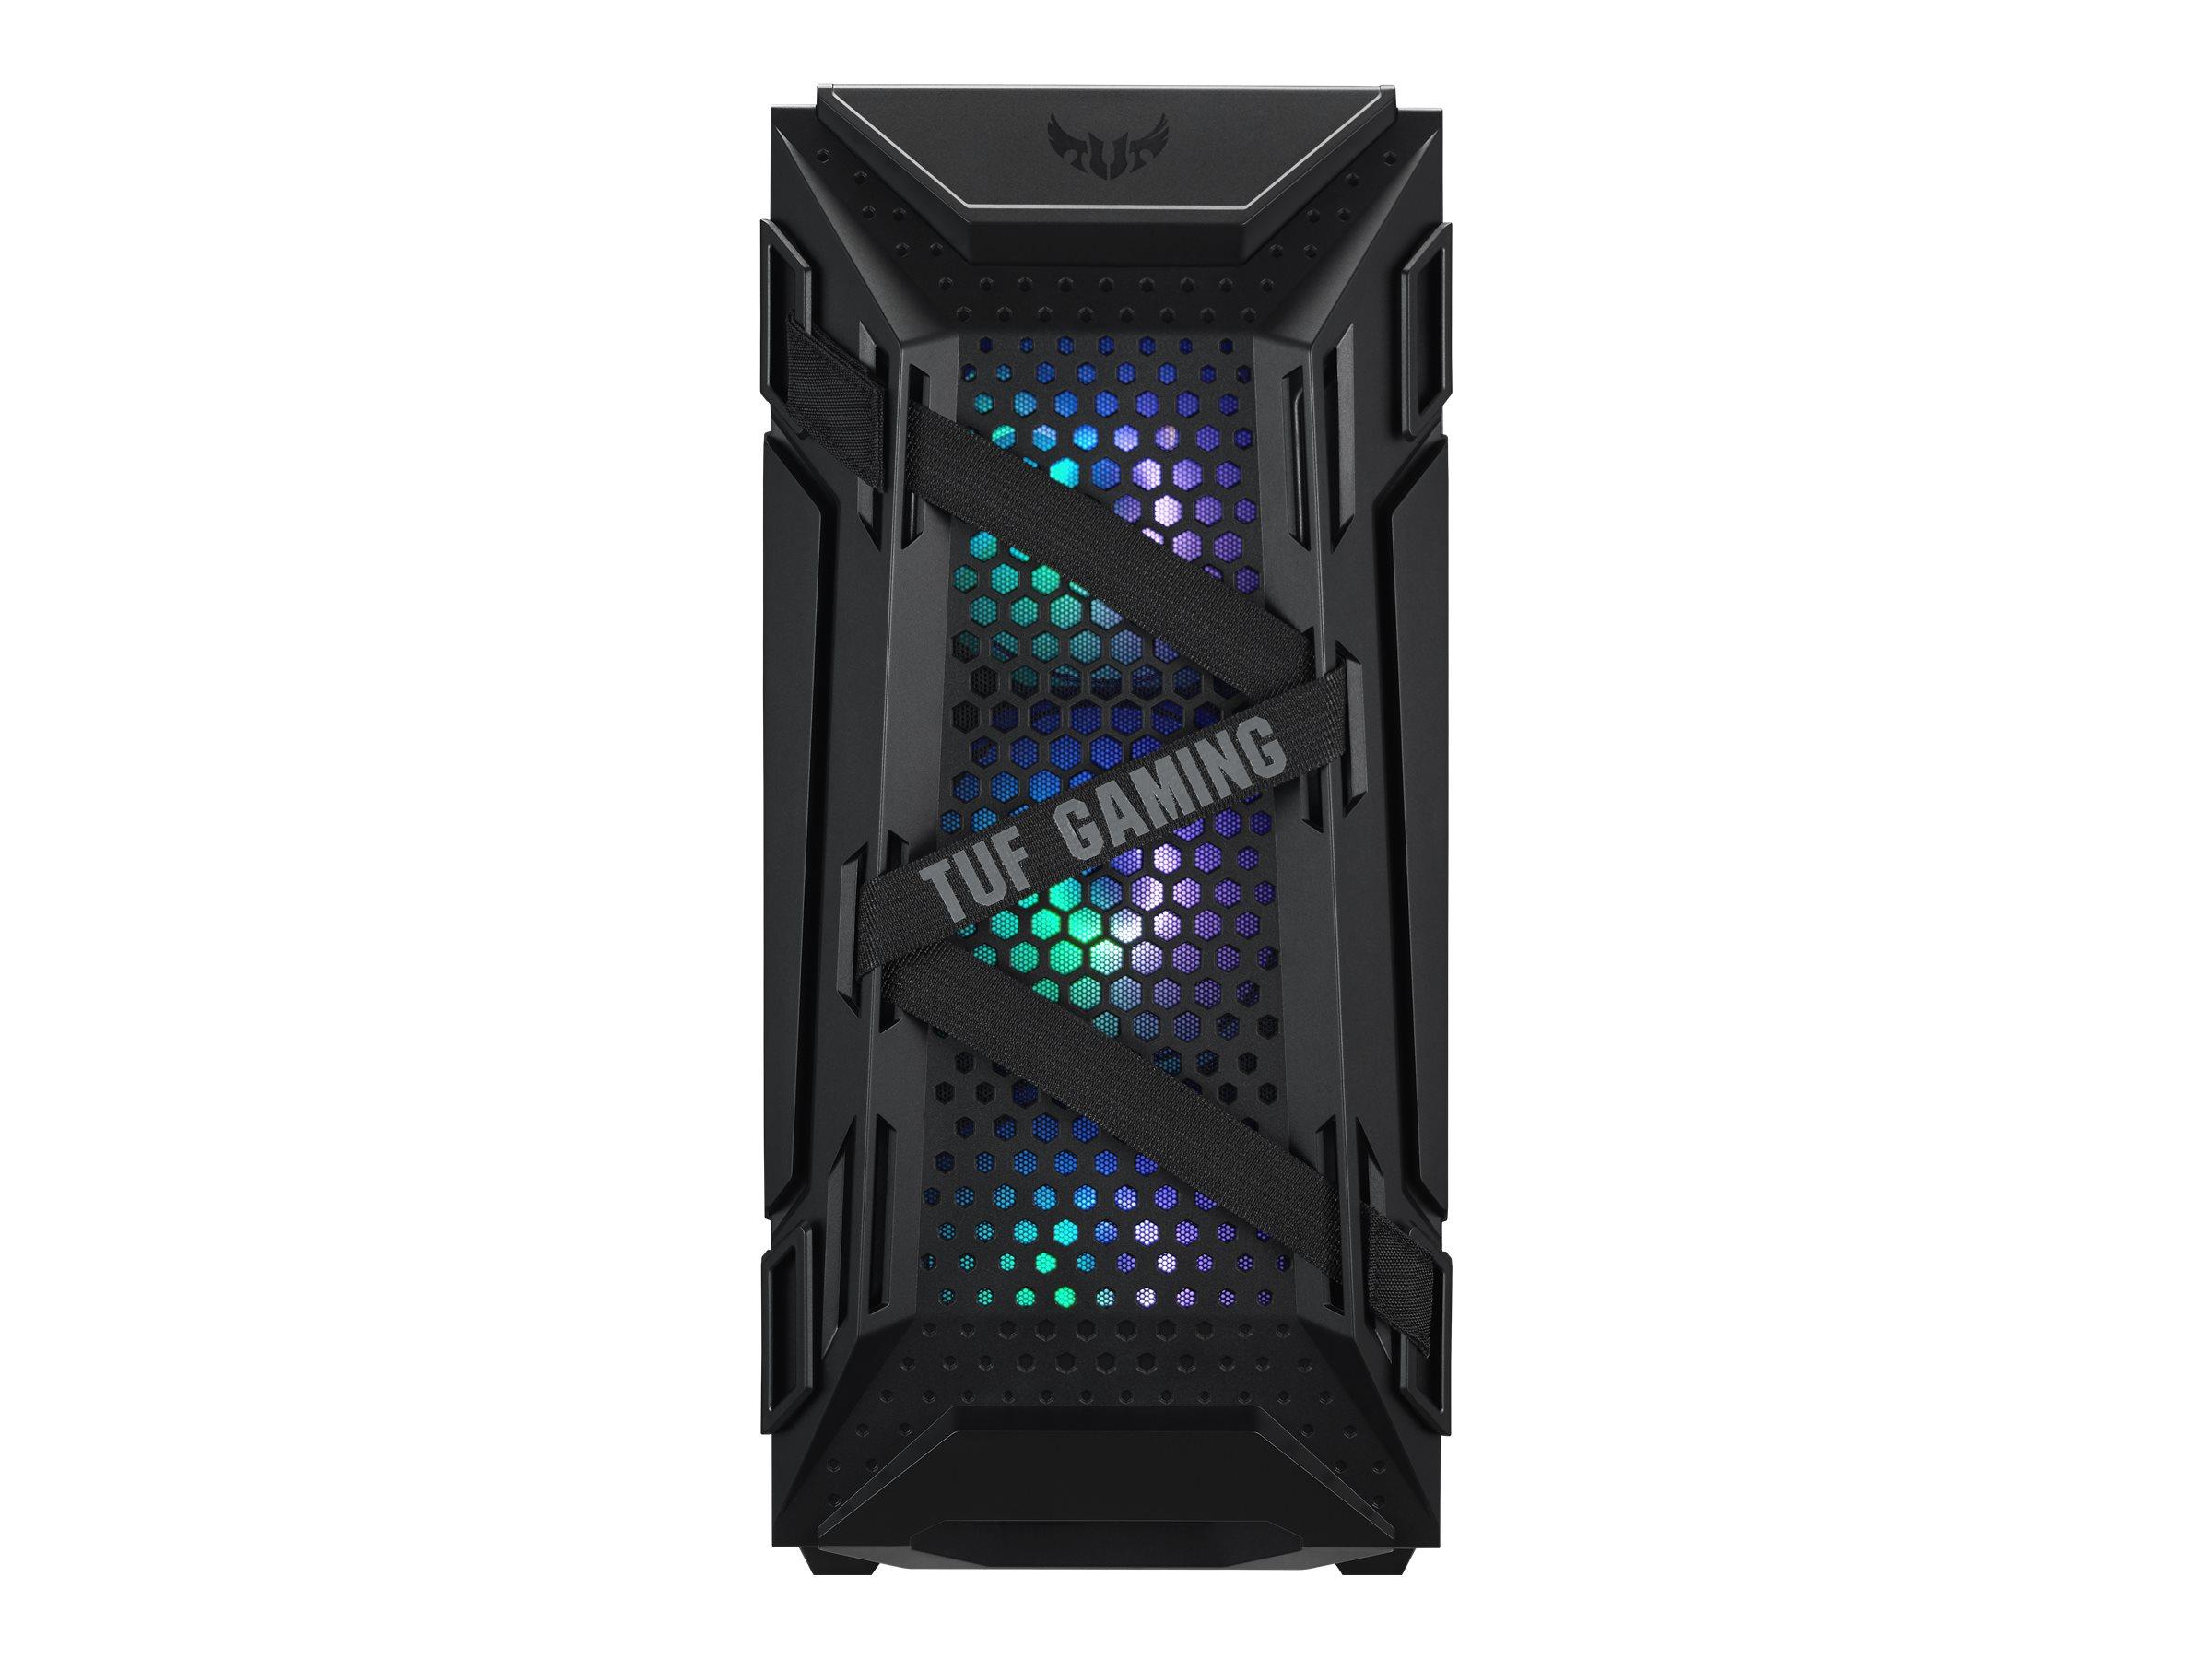 ASUS TUF Gaming GT301 - Tower - ATX - Schwarz - USB/Audio